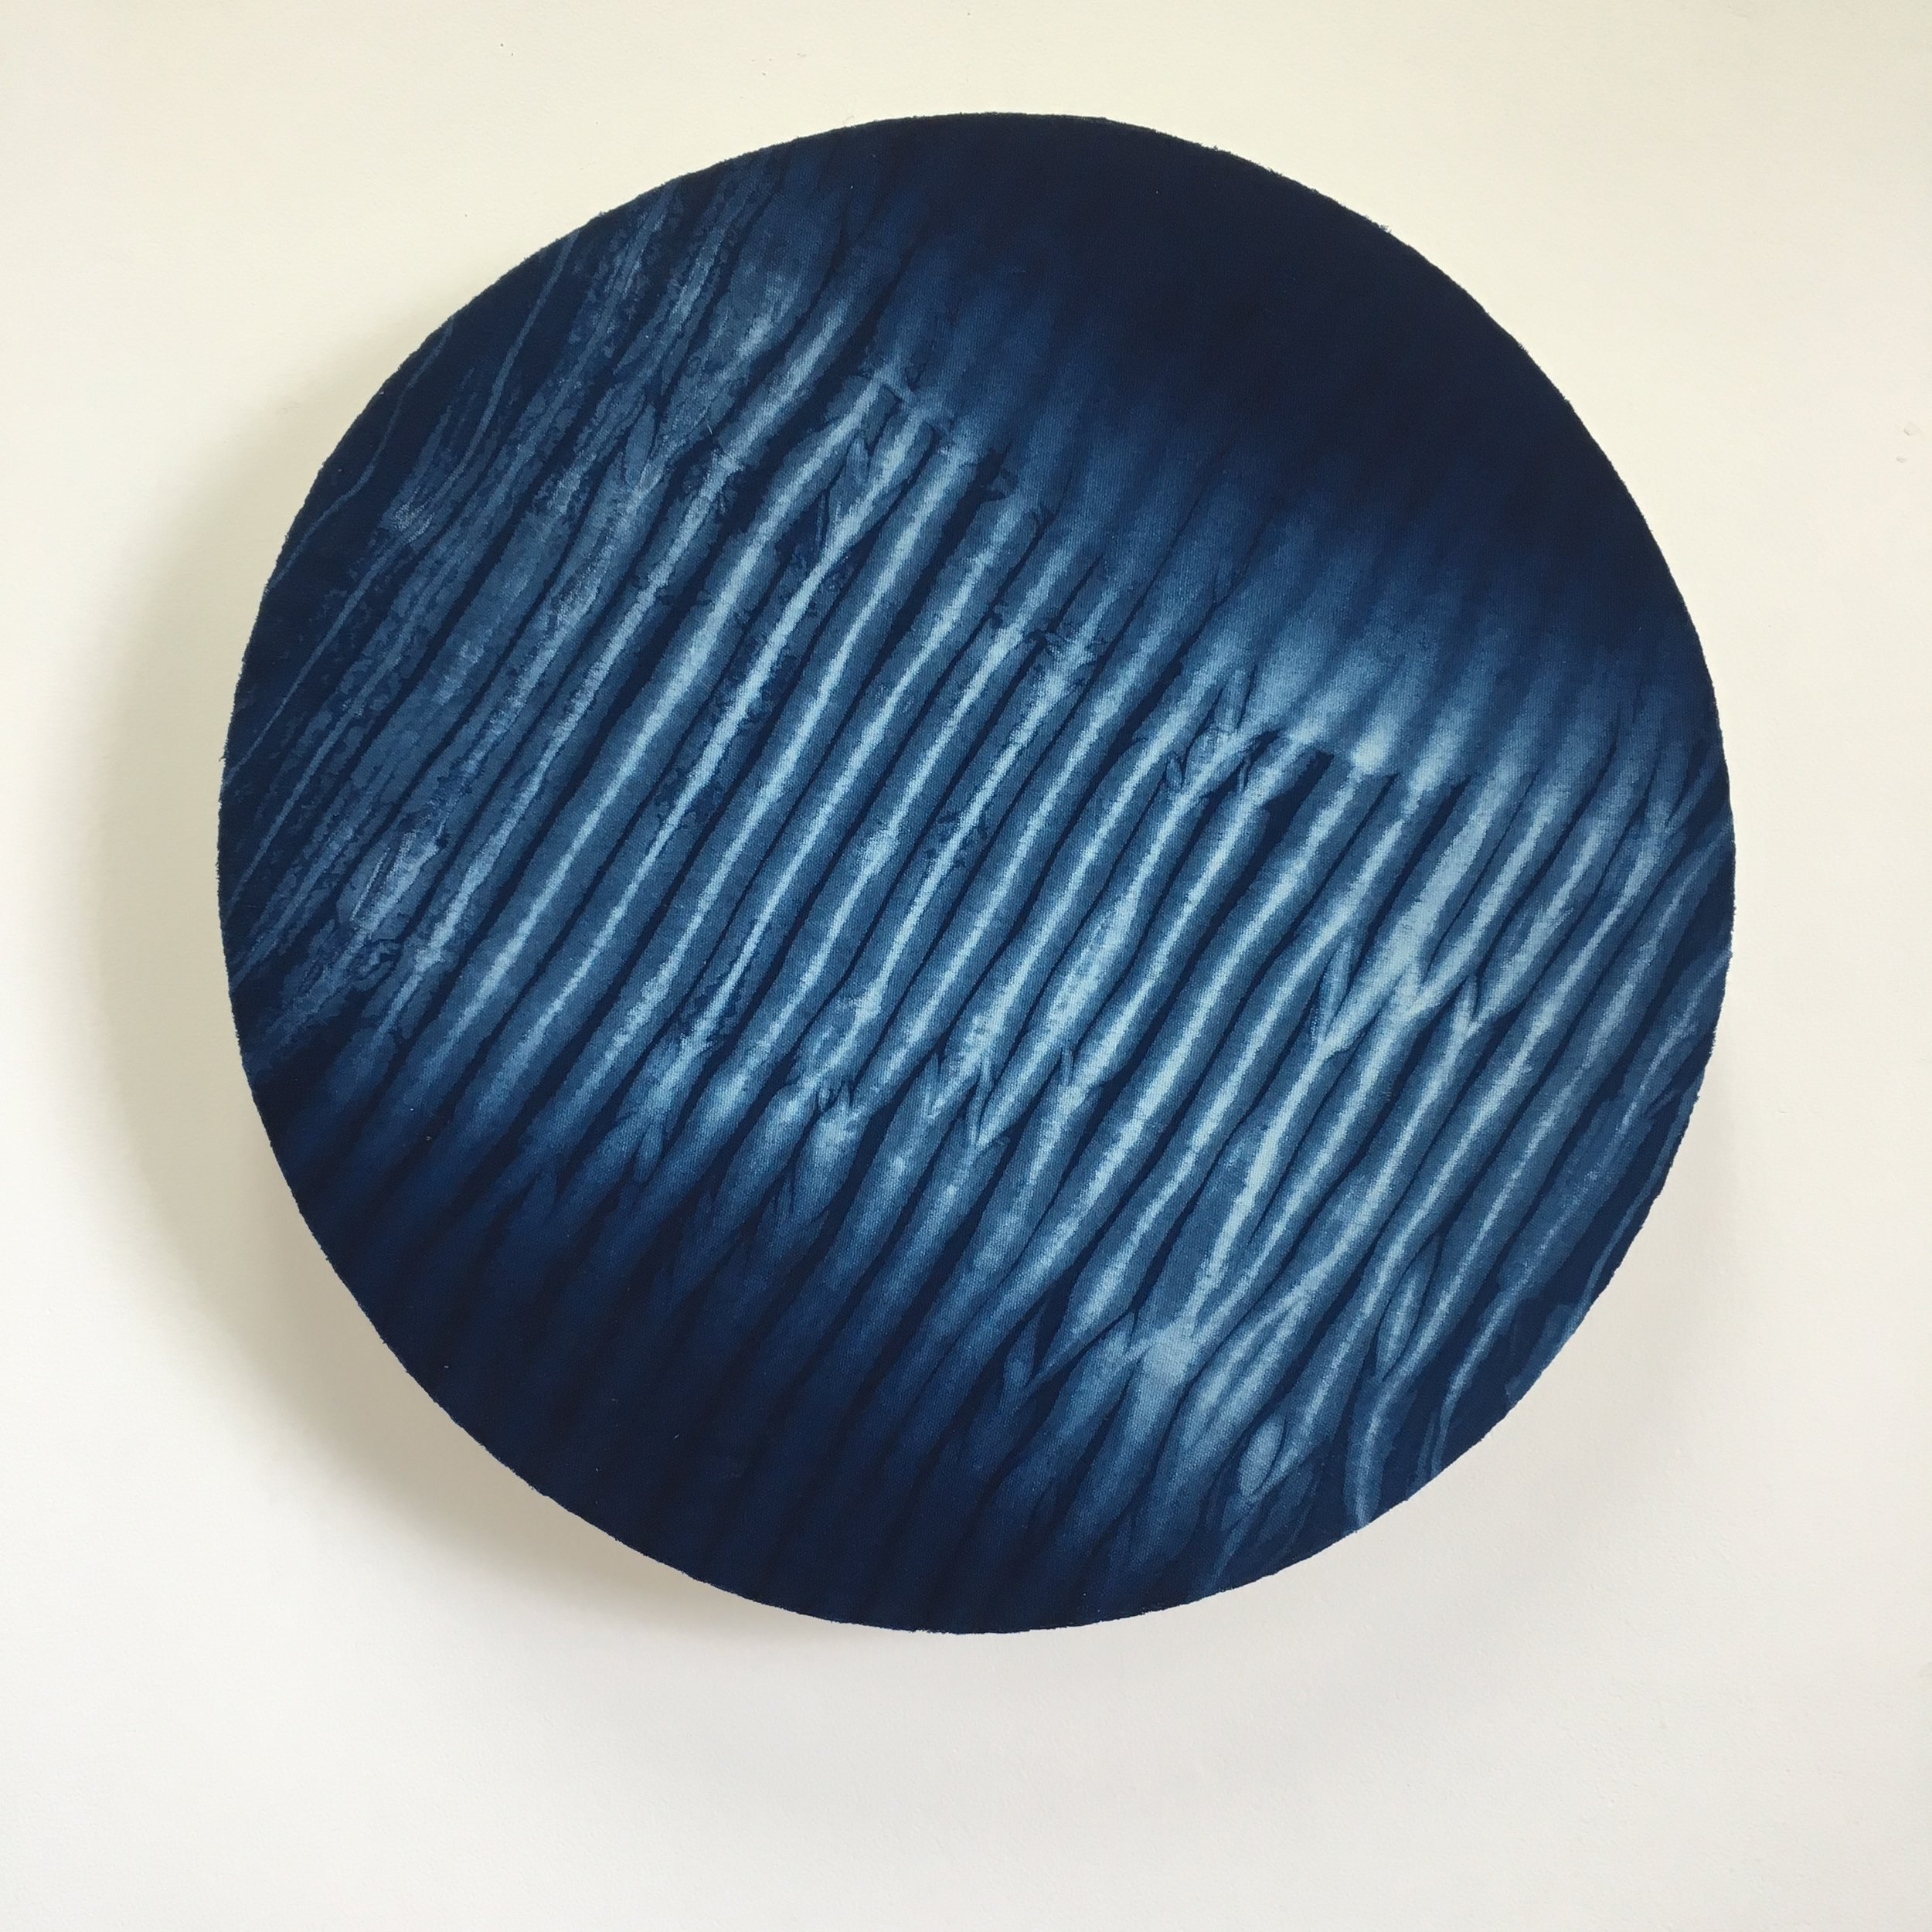 Indigo bound and dipped #2    Indigo dyed linen mounted onto layered plywood 550 x 550 x 70